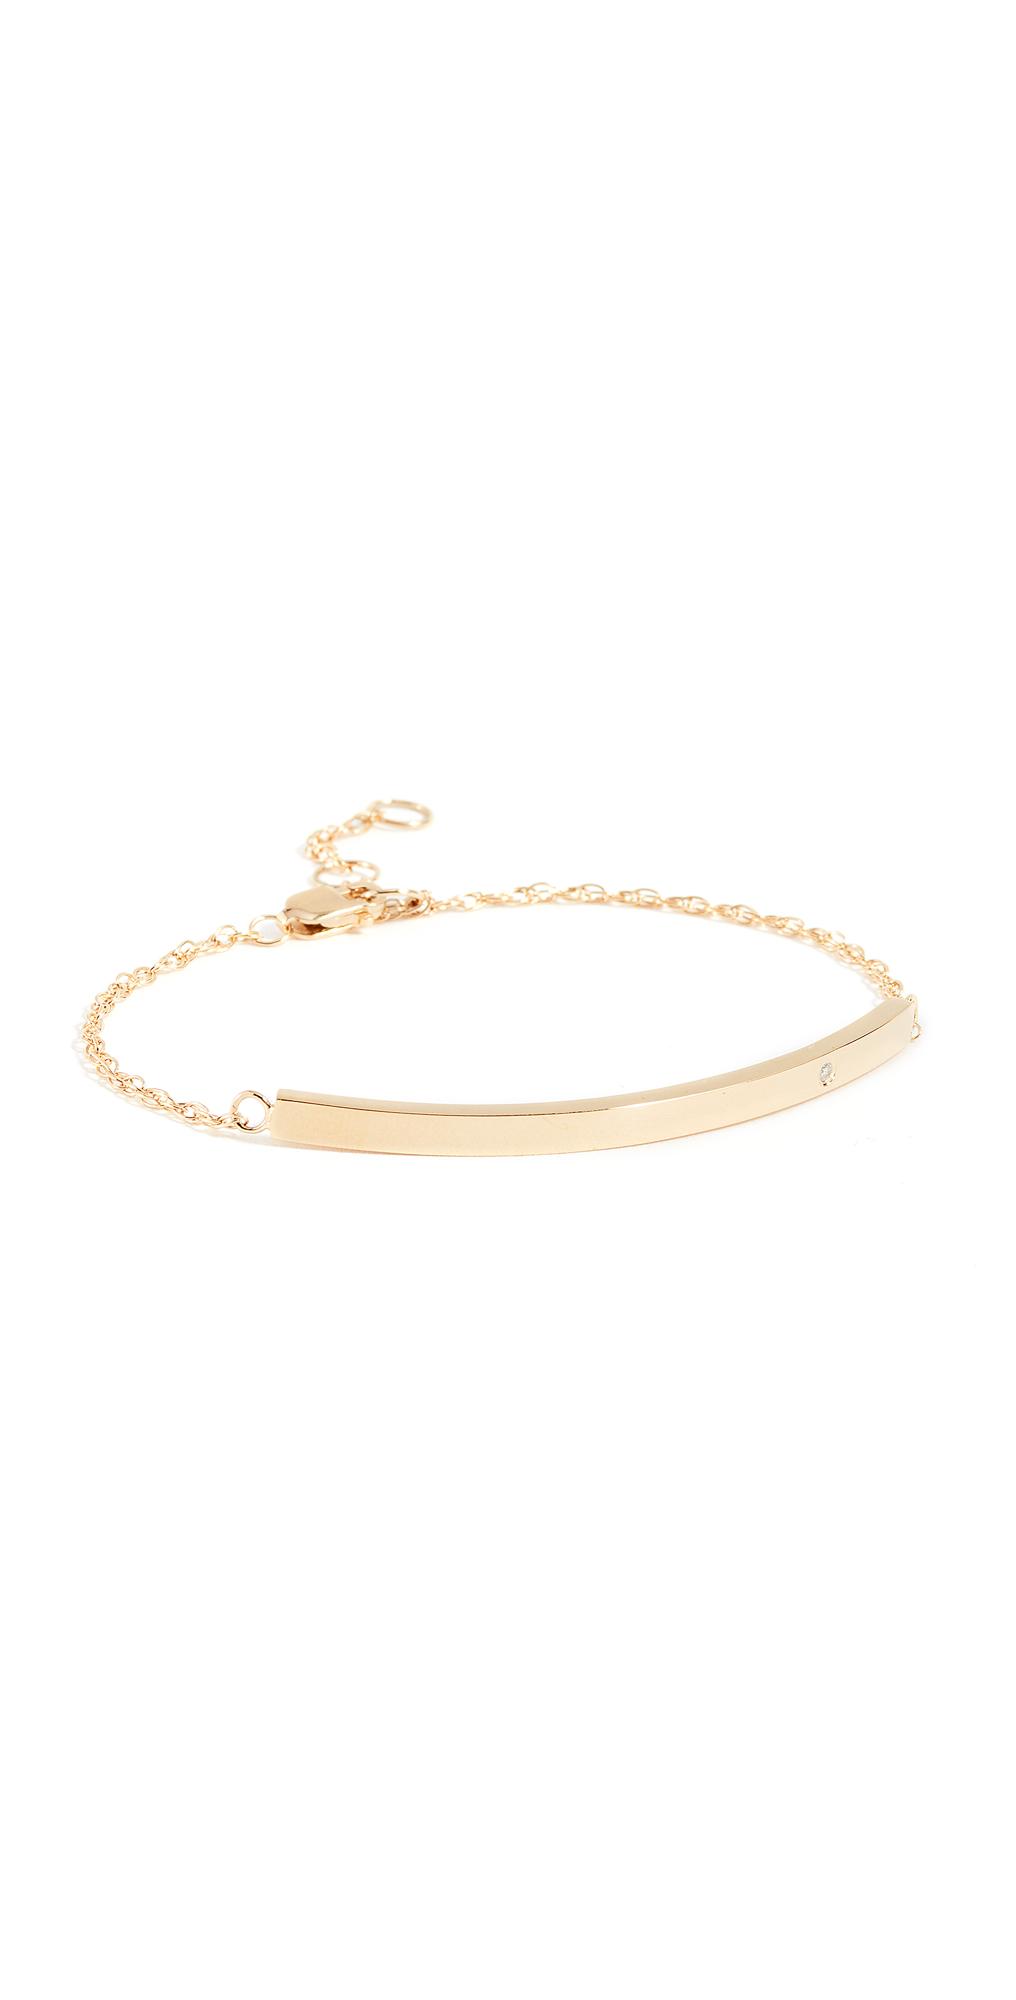 Horizontal Bar Bracelet with Diamond